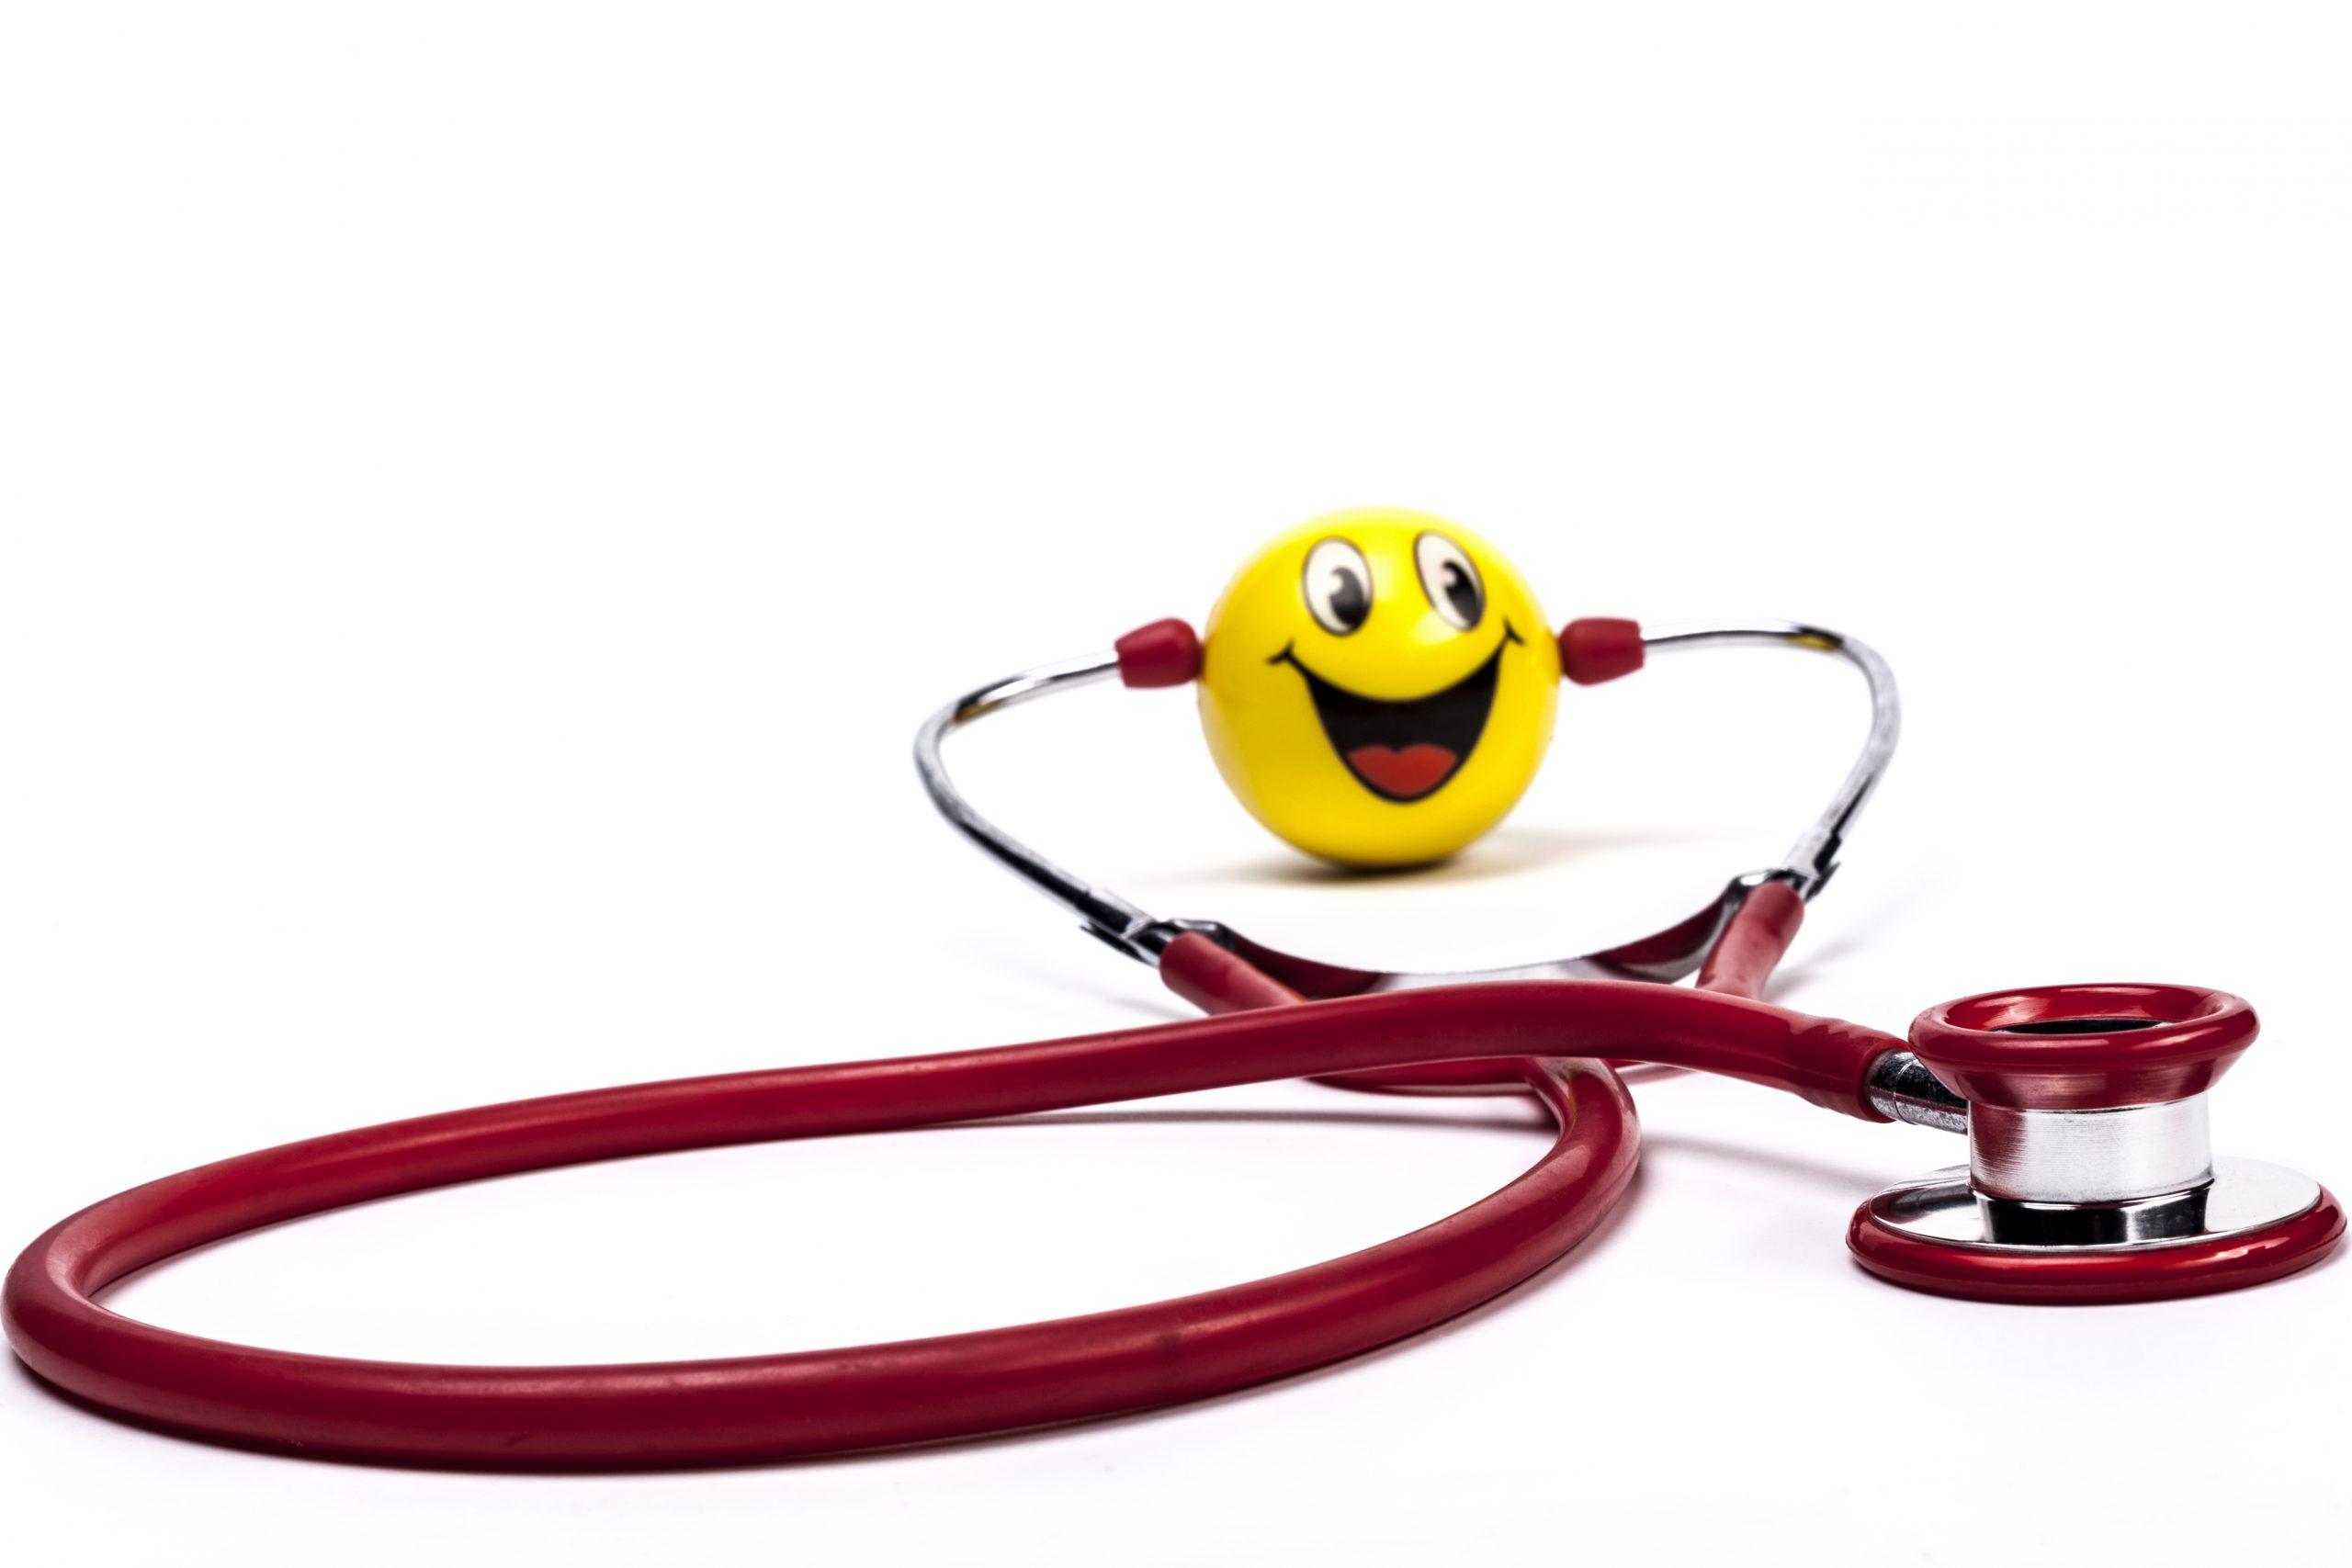 Happy Red Stethoscope